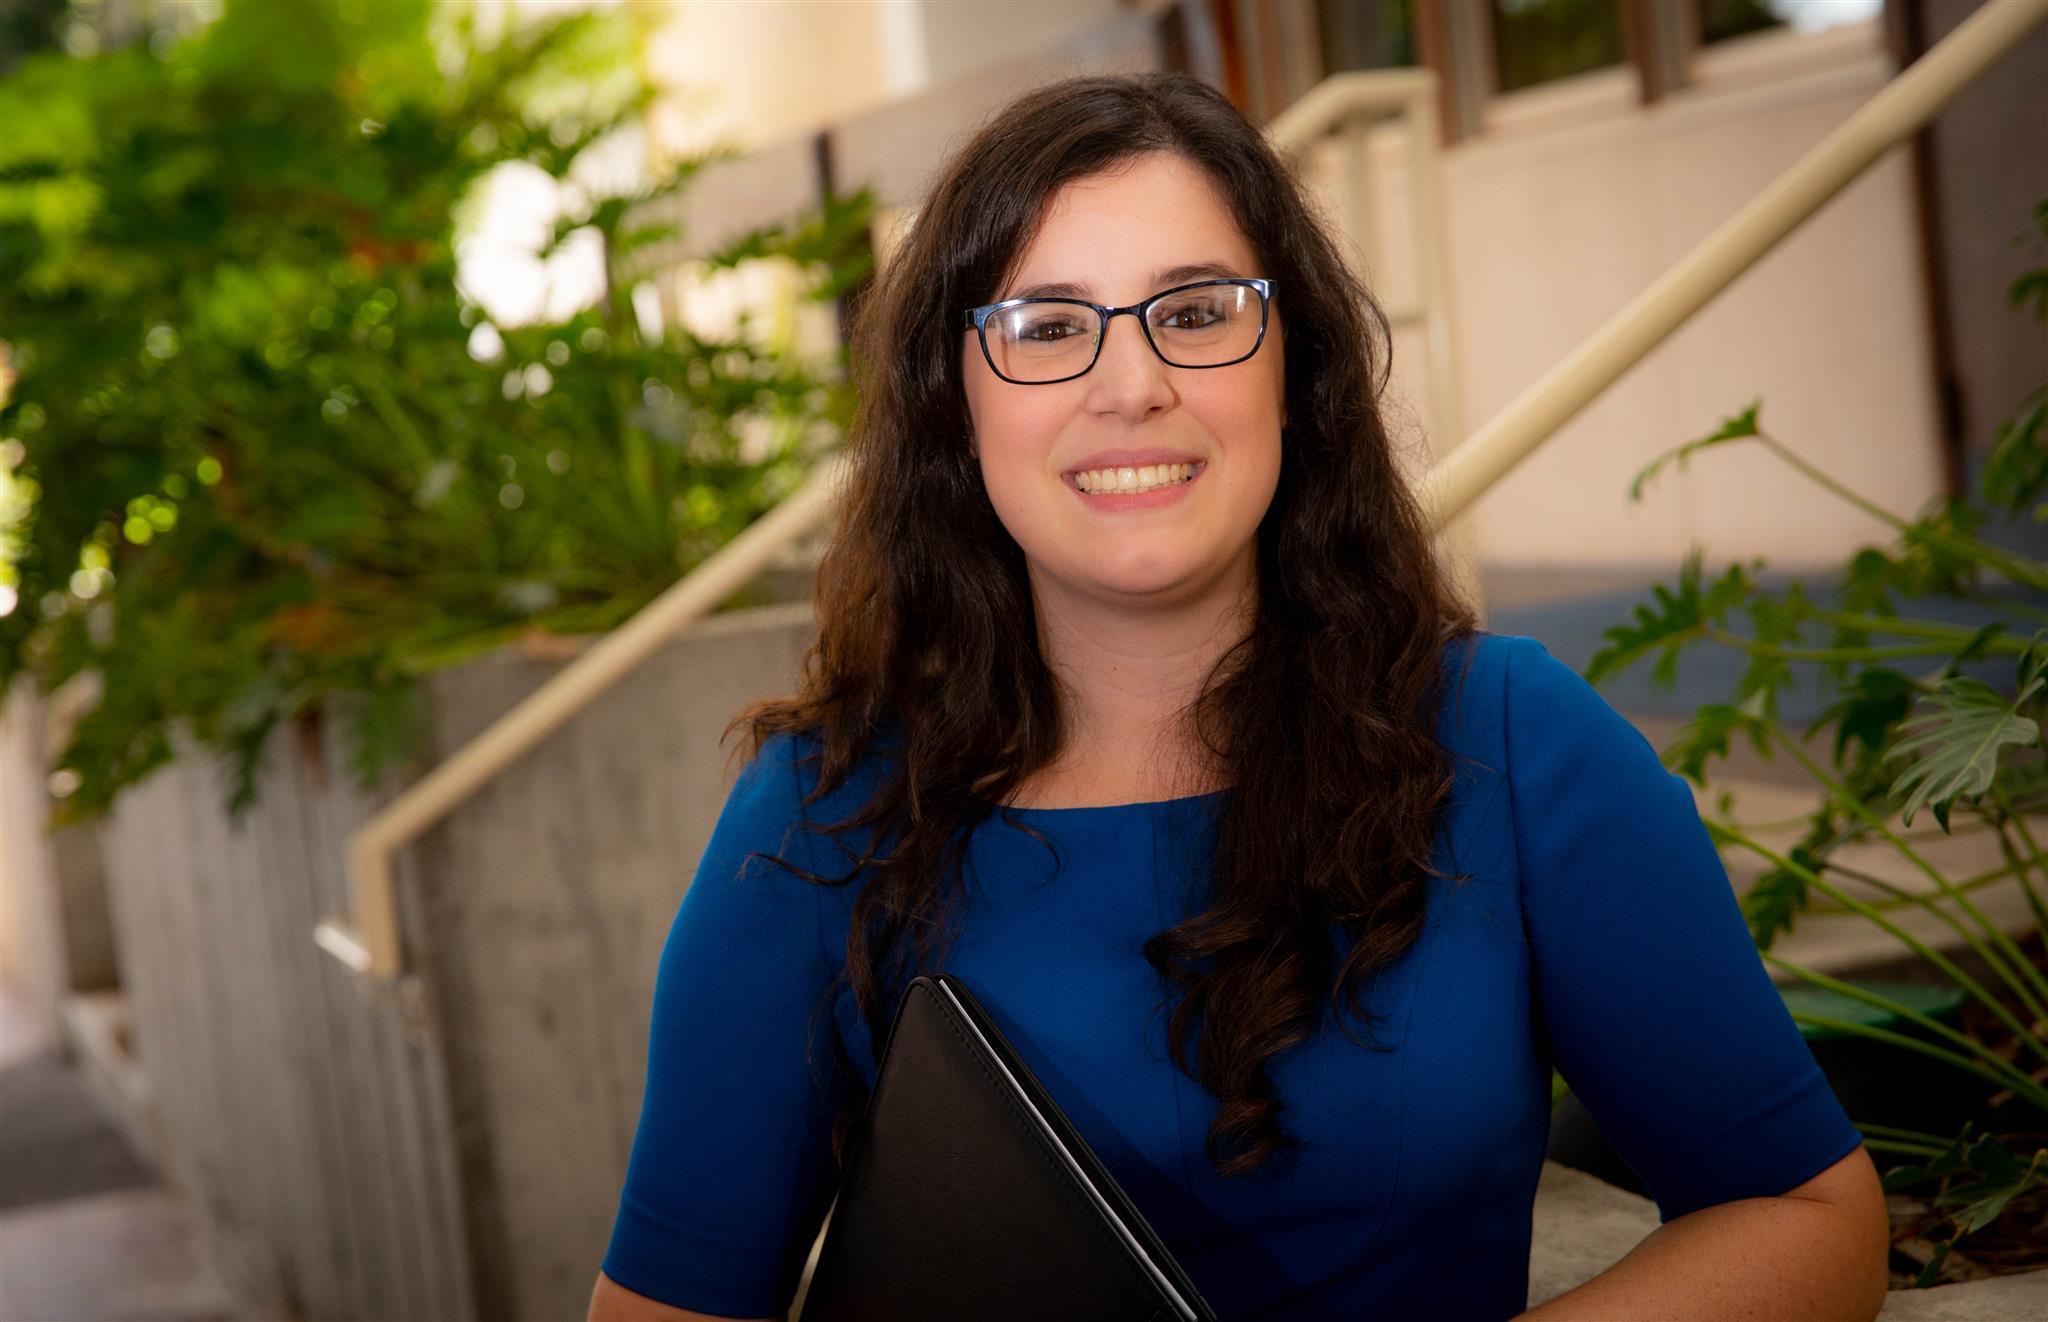 Geena Cesar, Saint of Santa Fe College for August 21, 2018